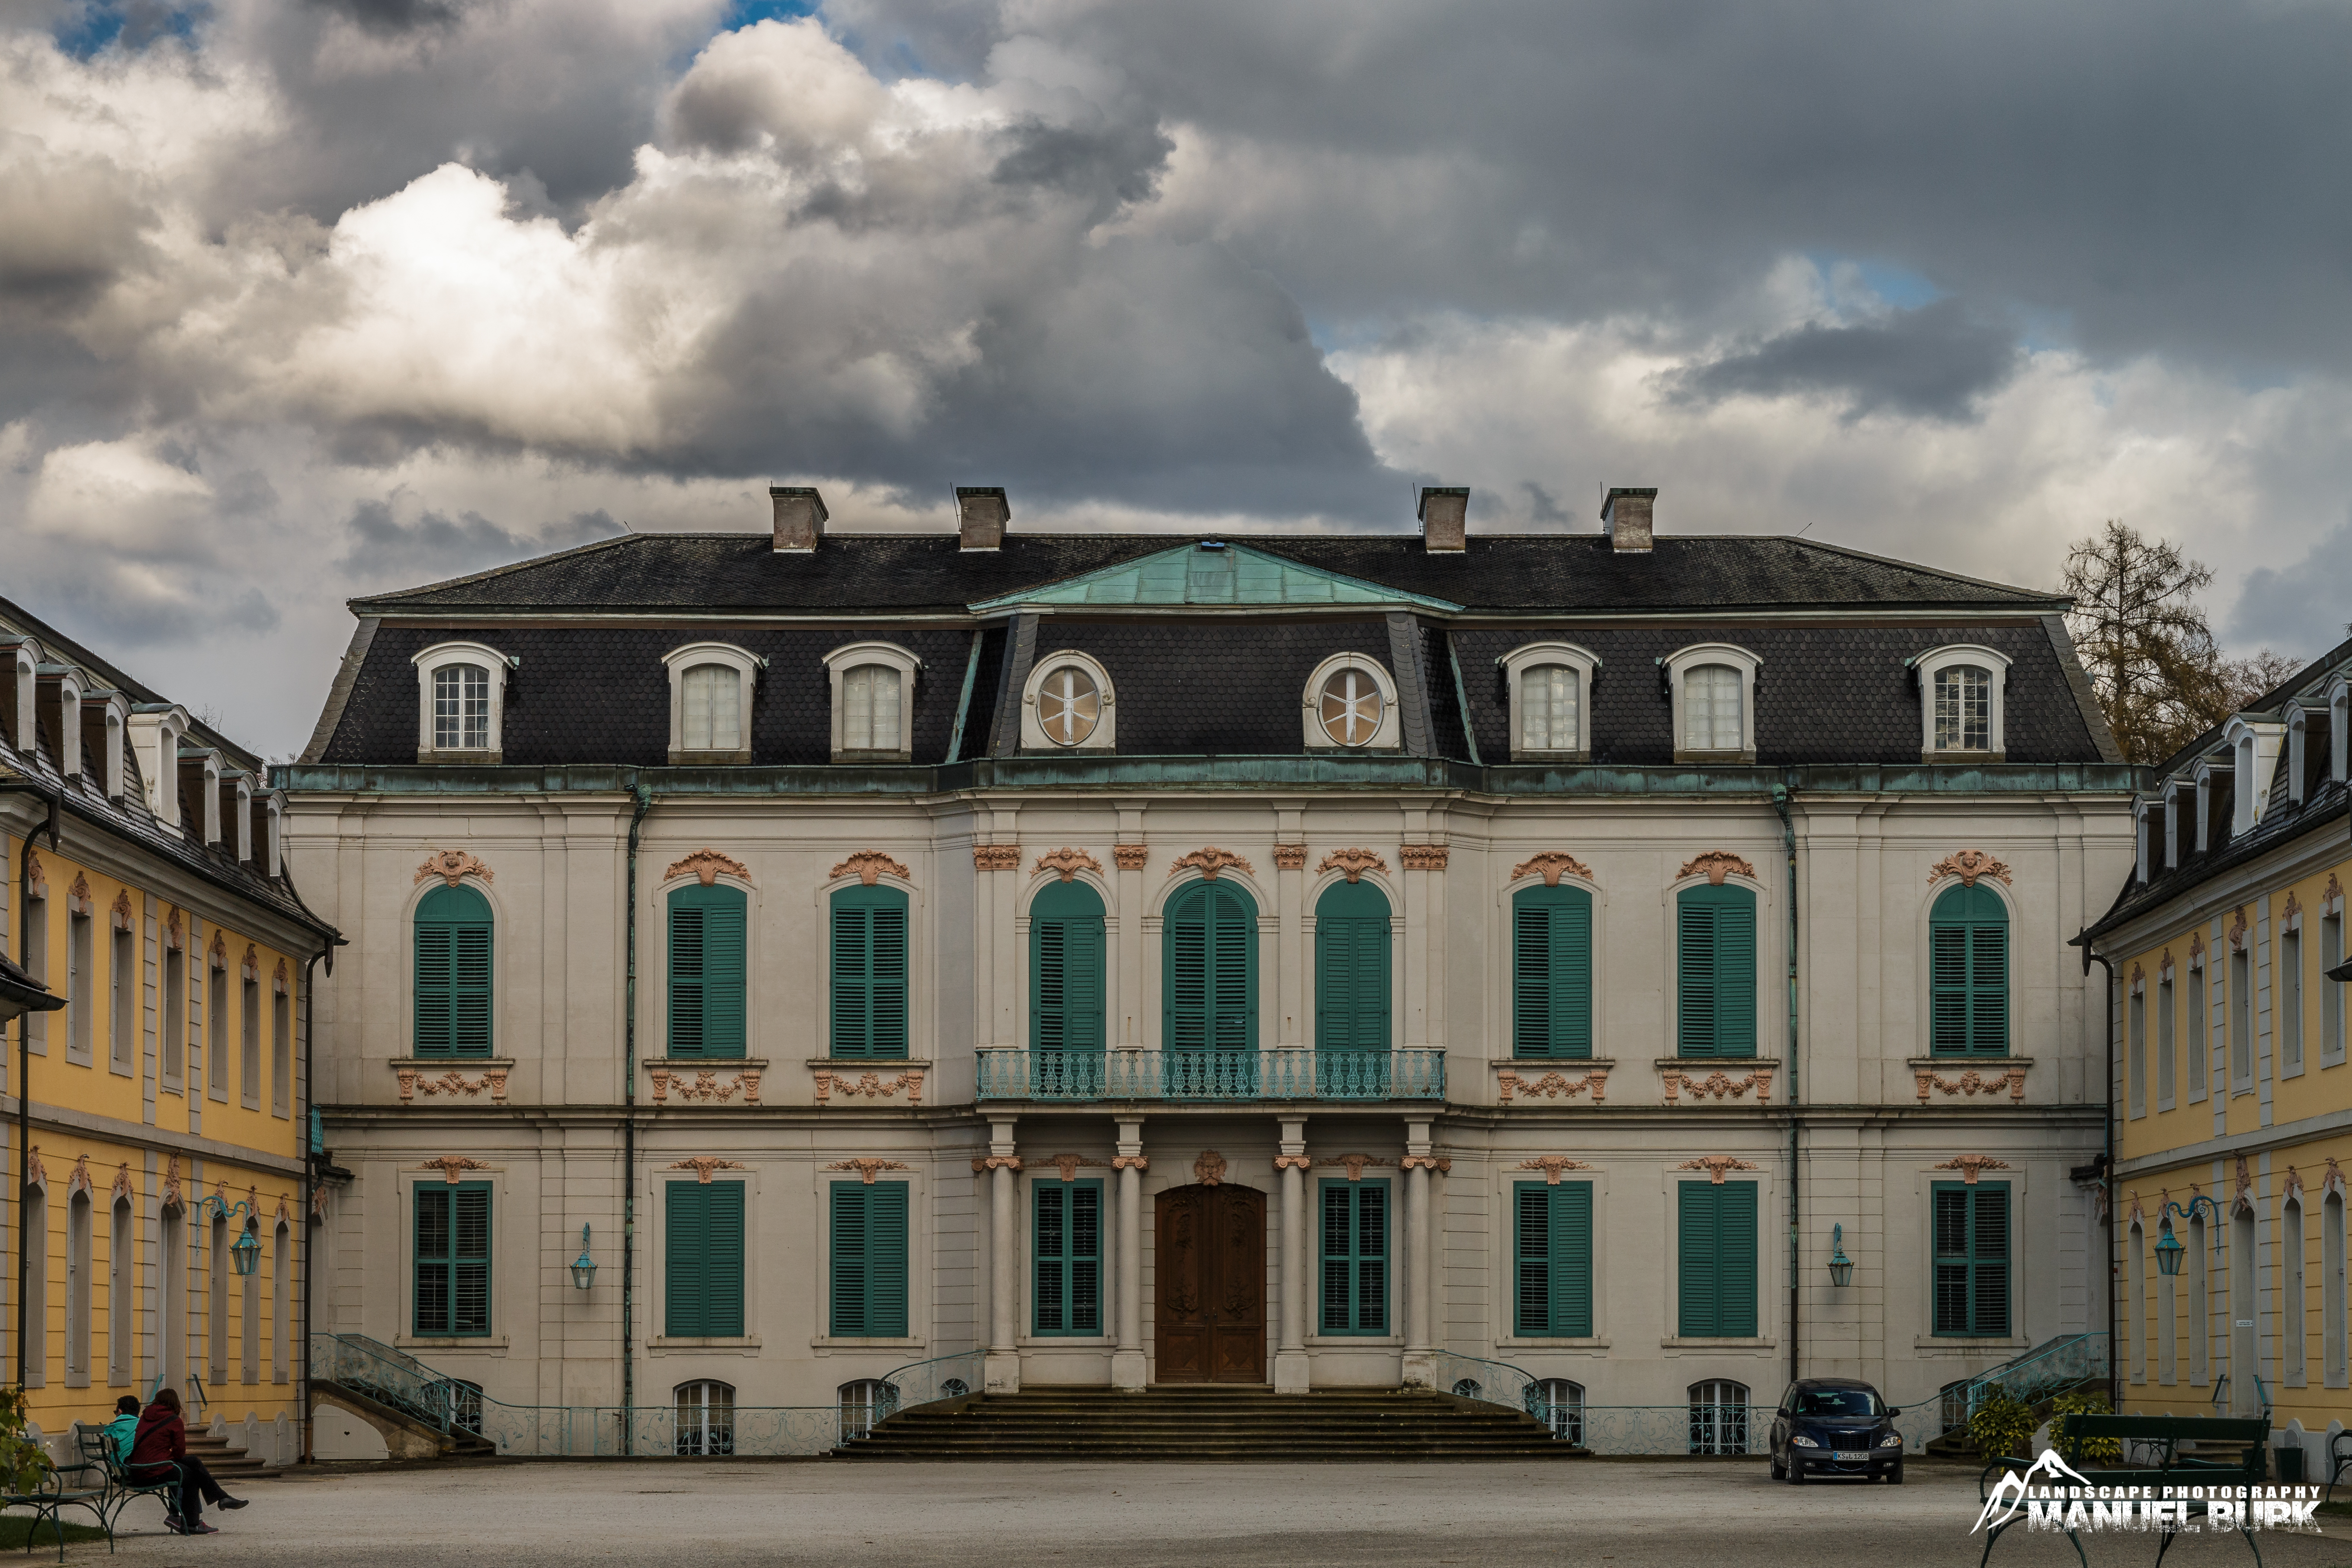 Schloss Wilhelmstal